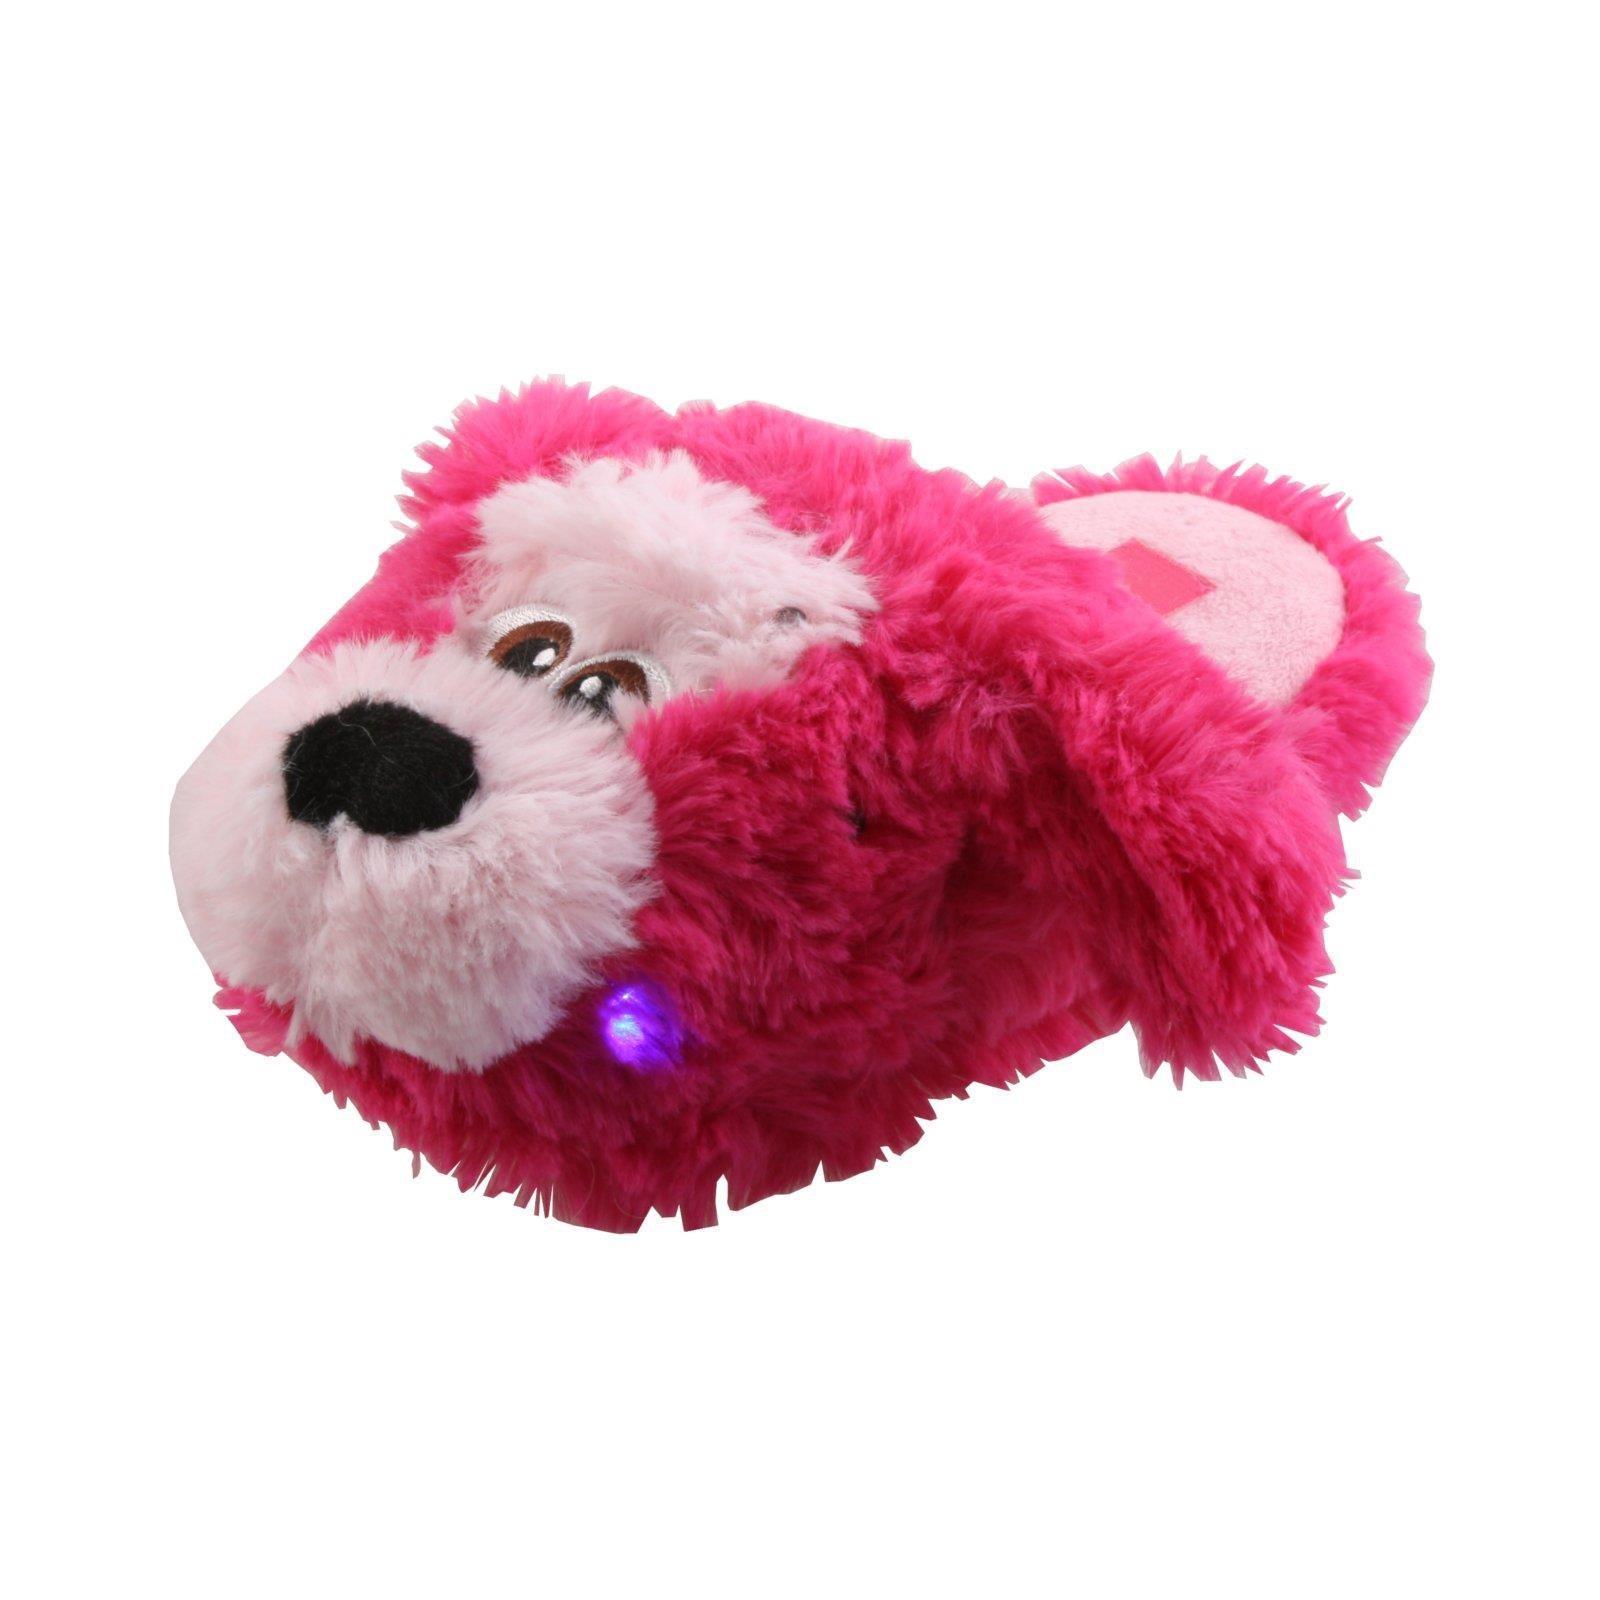 Löwe Affe Hund Einhorn LED Tier Hausschuhe Pantoffel Schlappen Plüsch 25-35